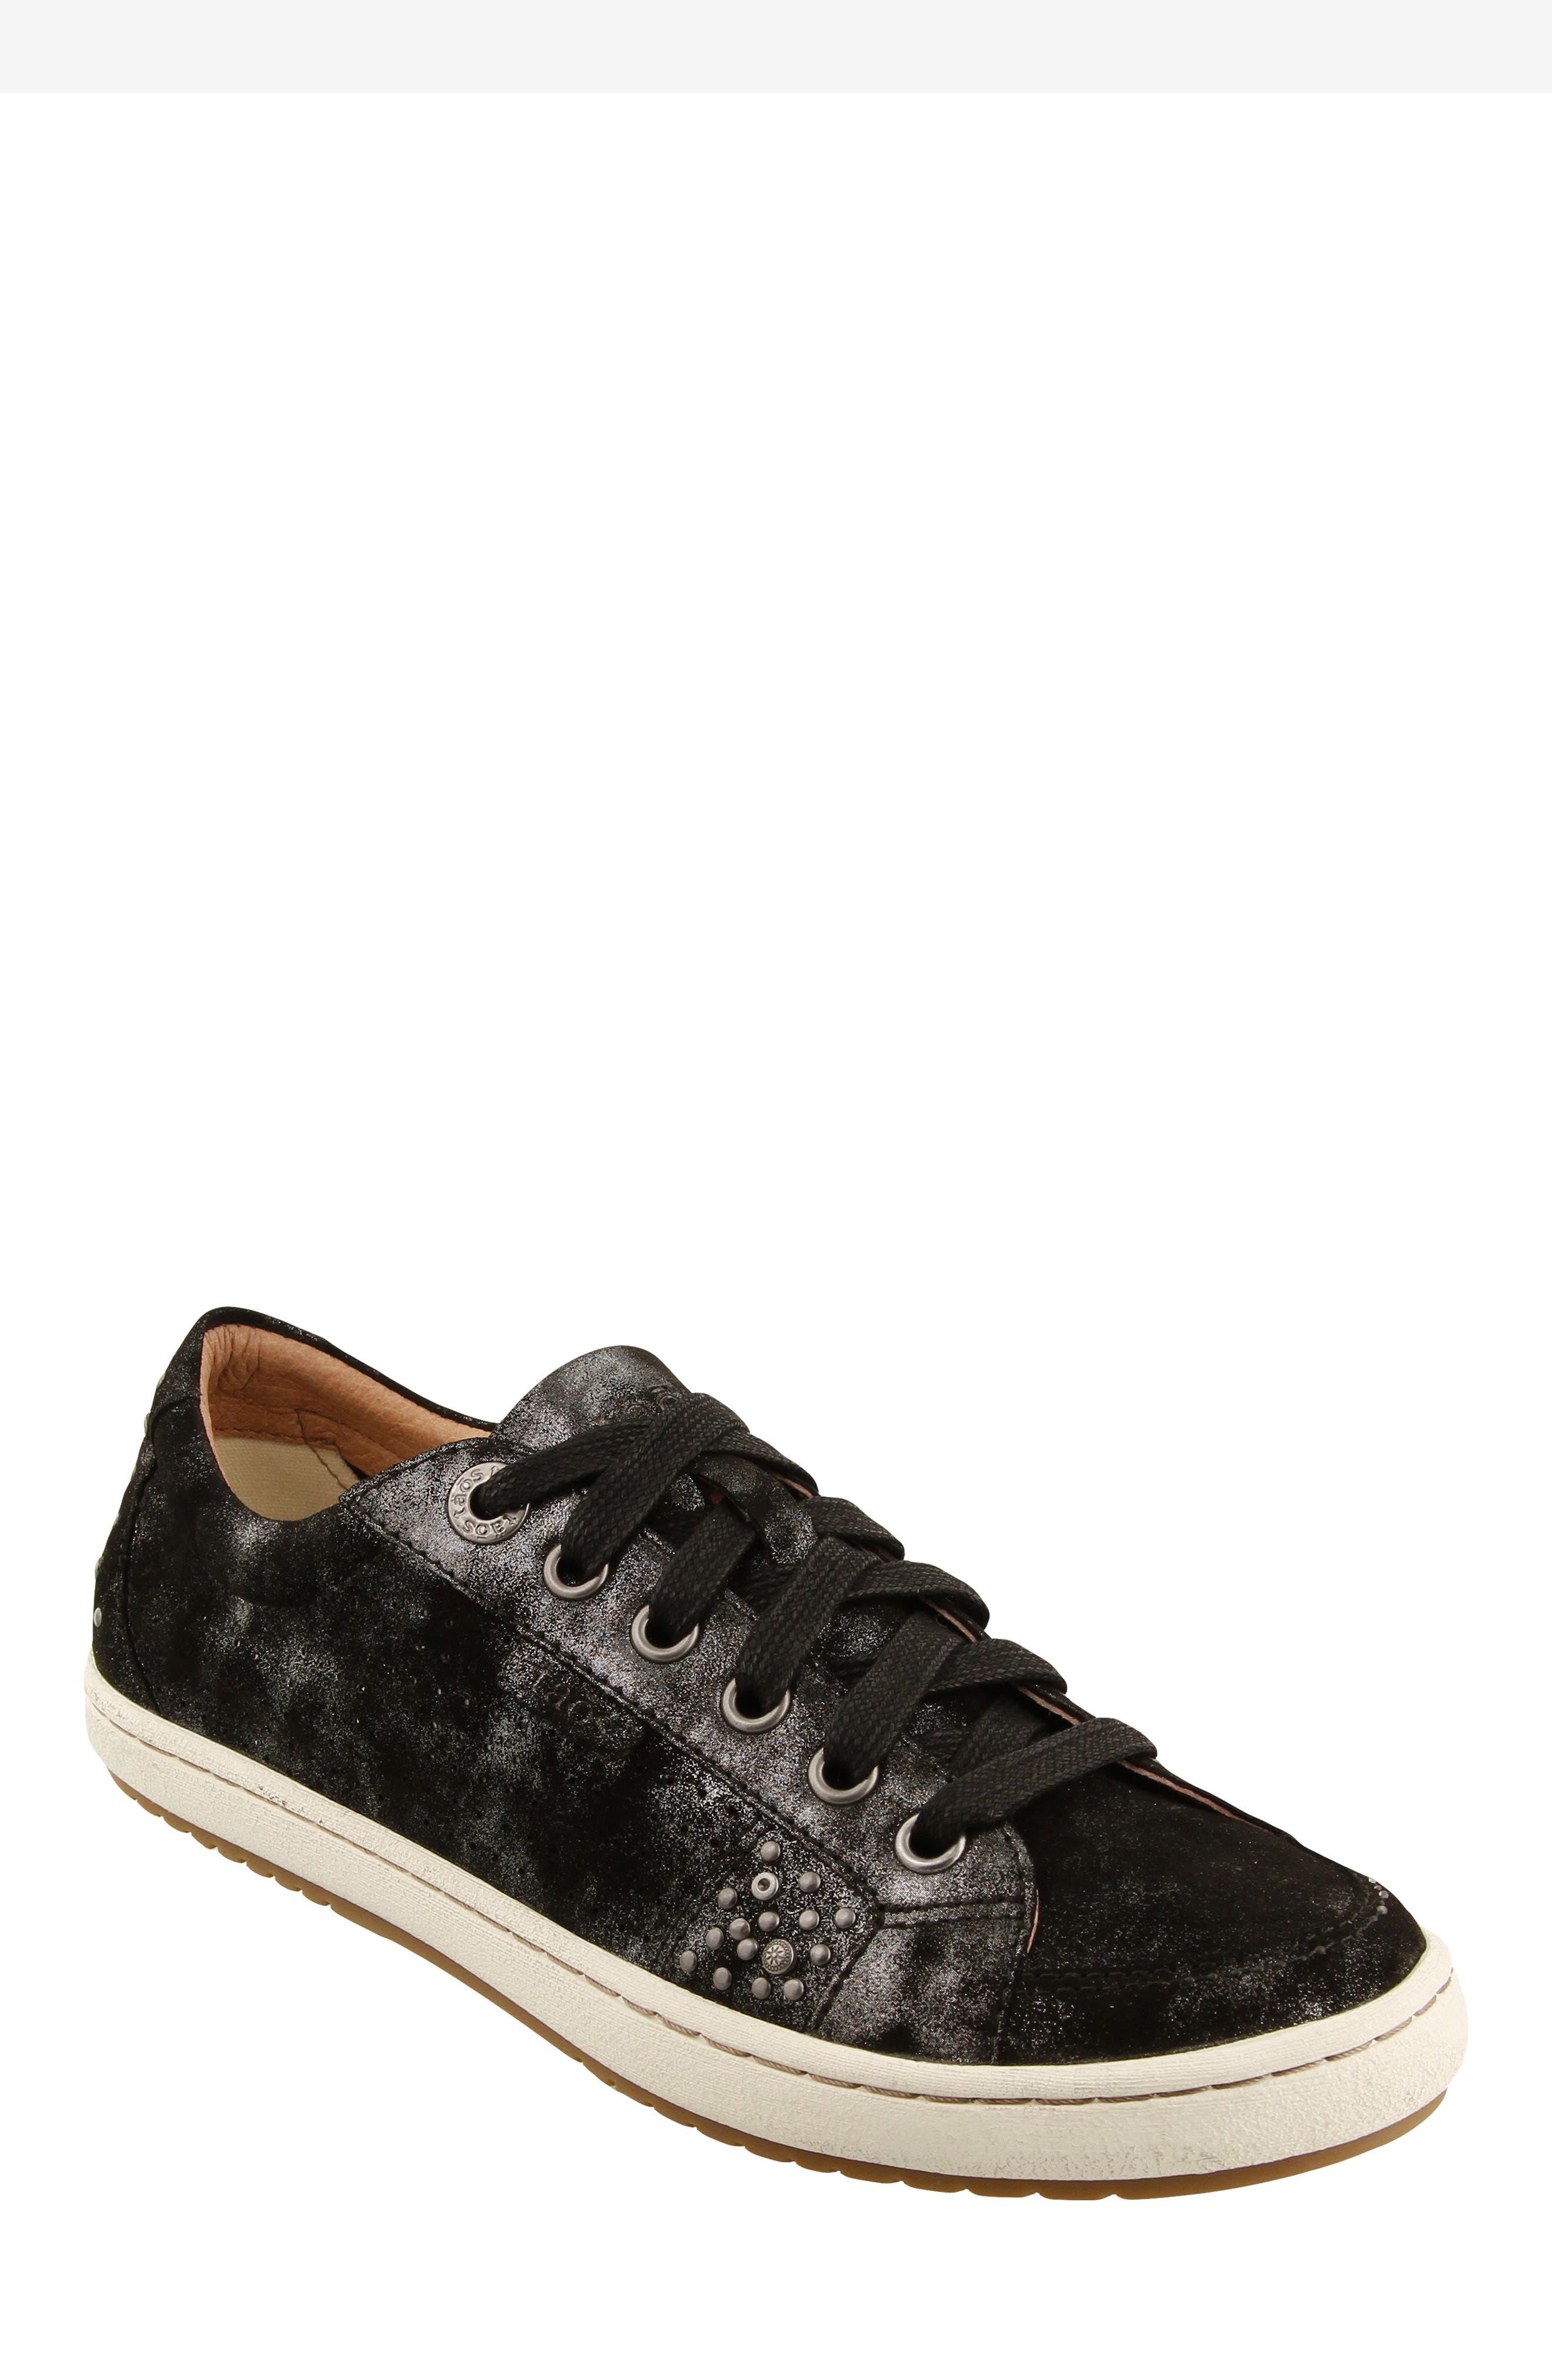 'Freedom' Sneaker,                         Main,                         color, BLACK METALLIC LEATHER